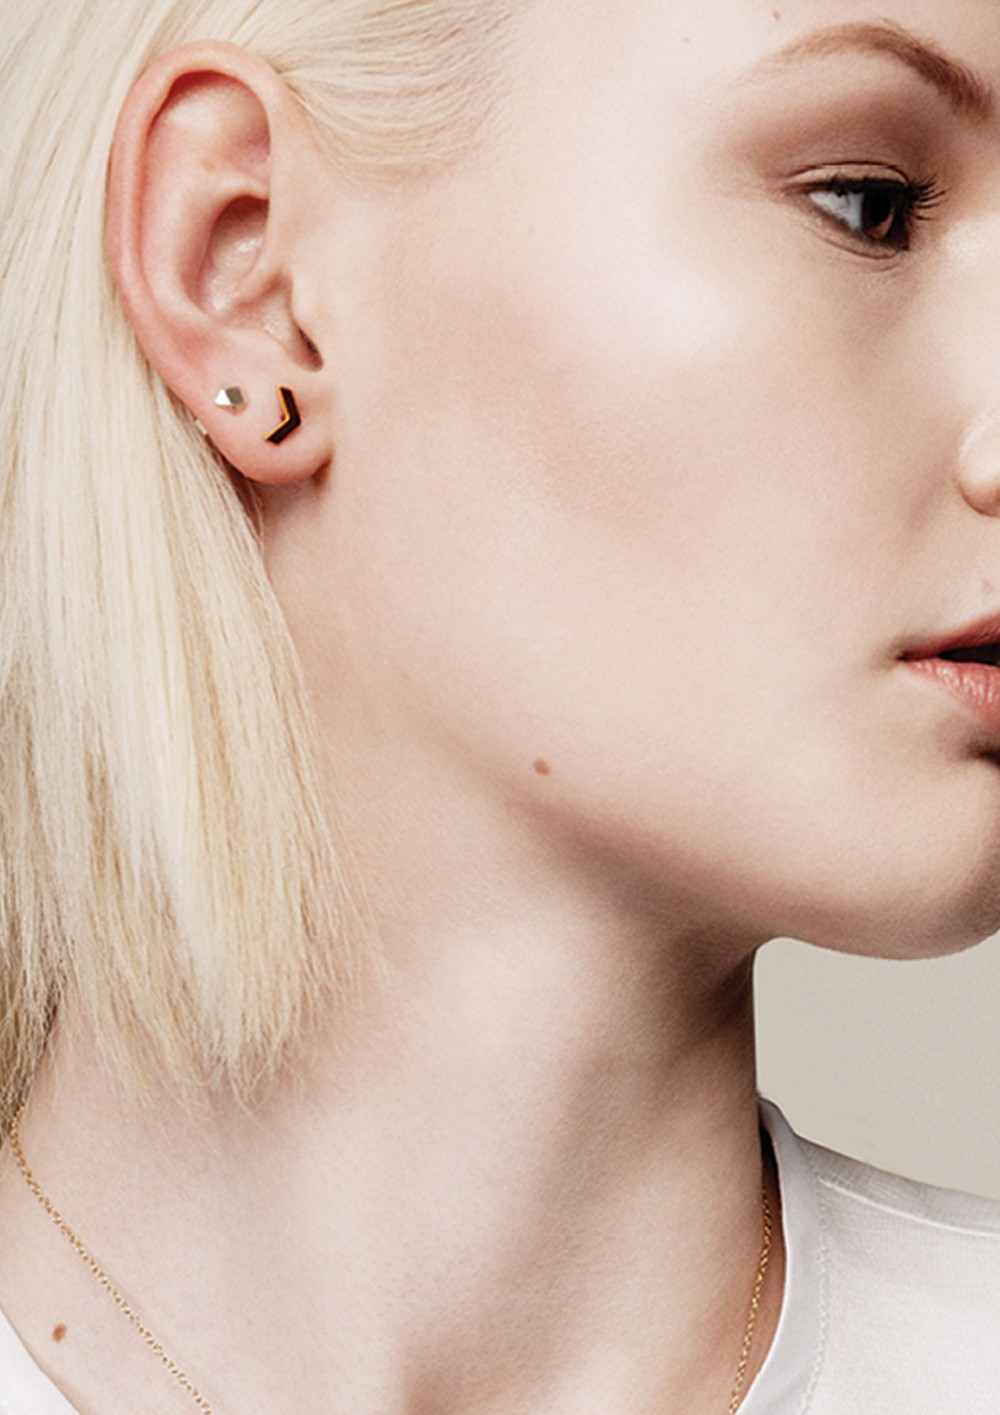 idamari_orvar-earrings-silver-feature_just-fashion_1.jpg